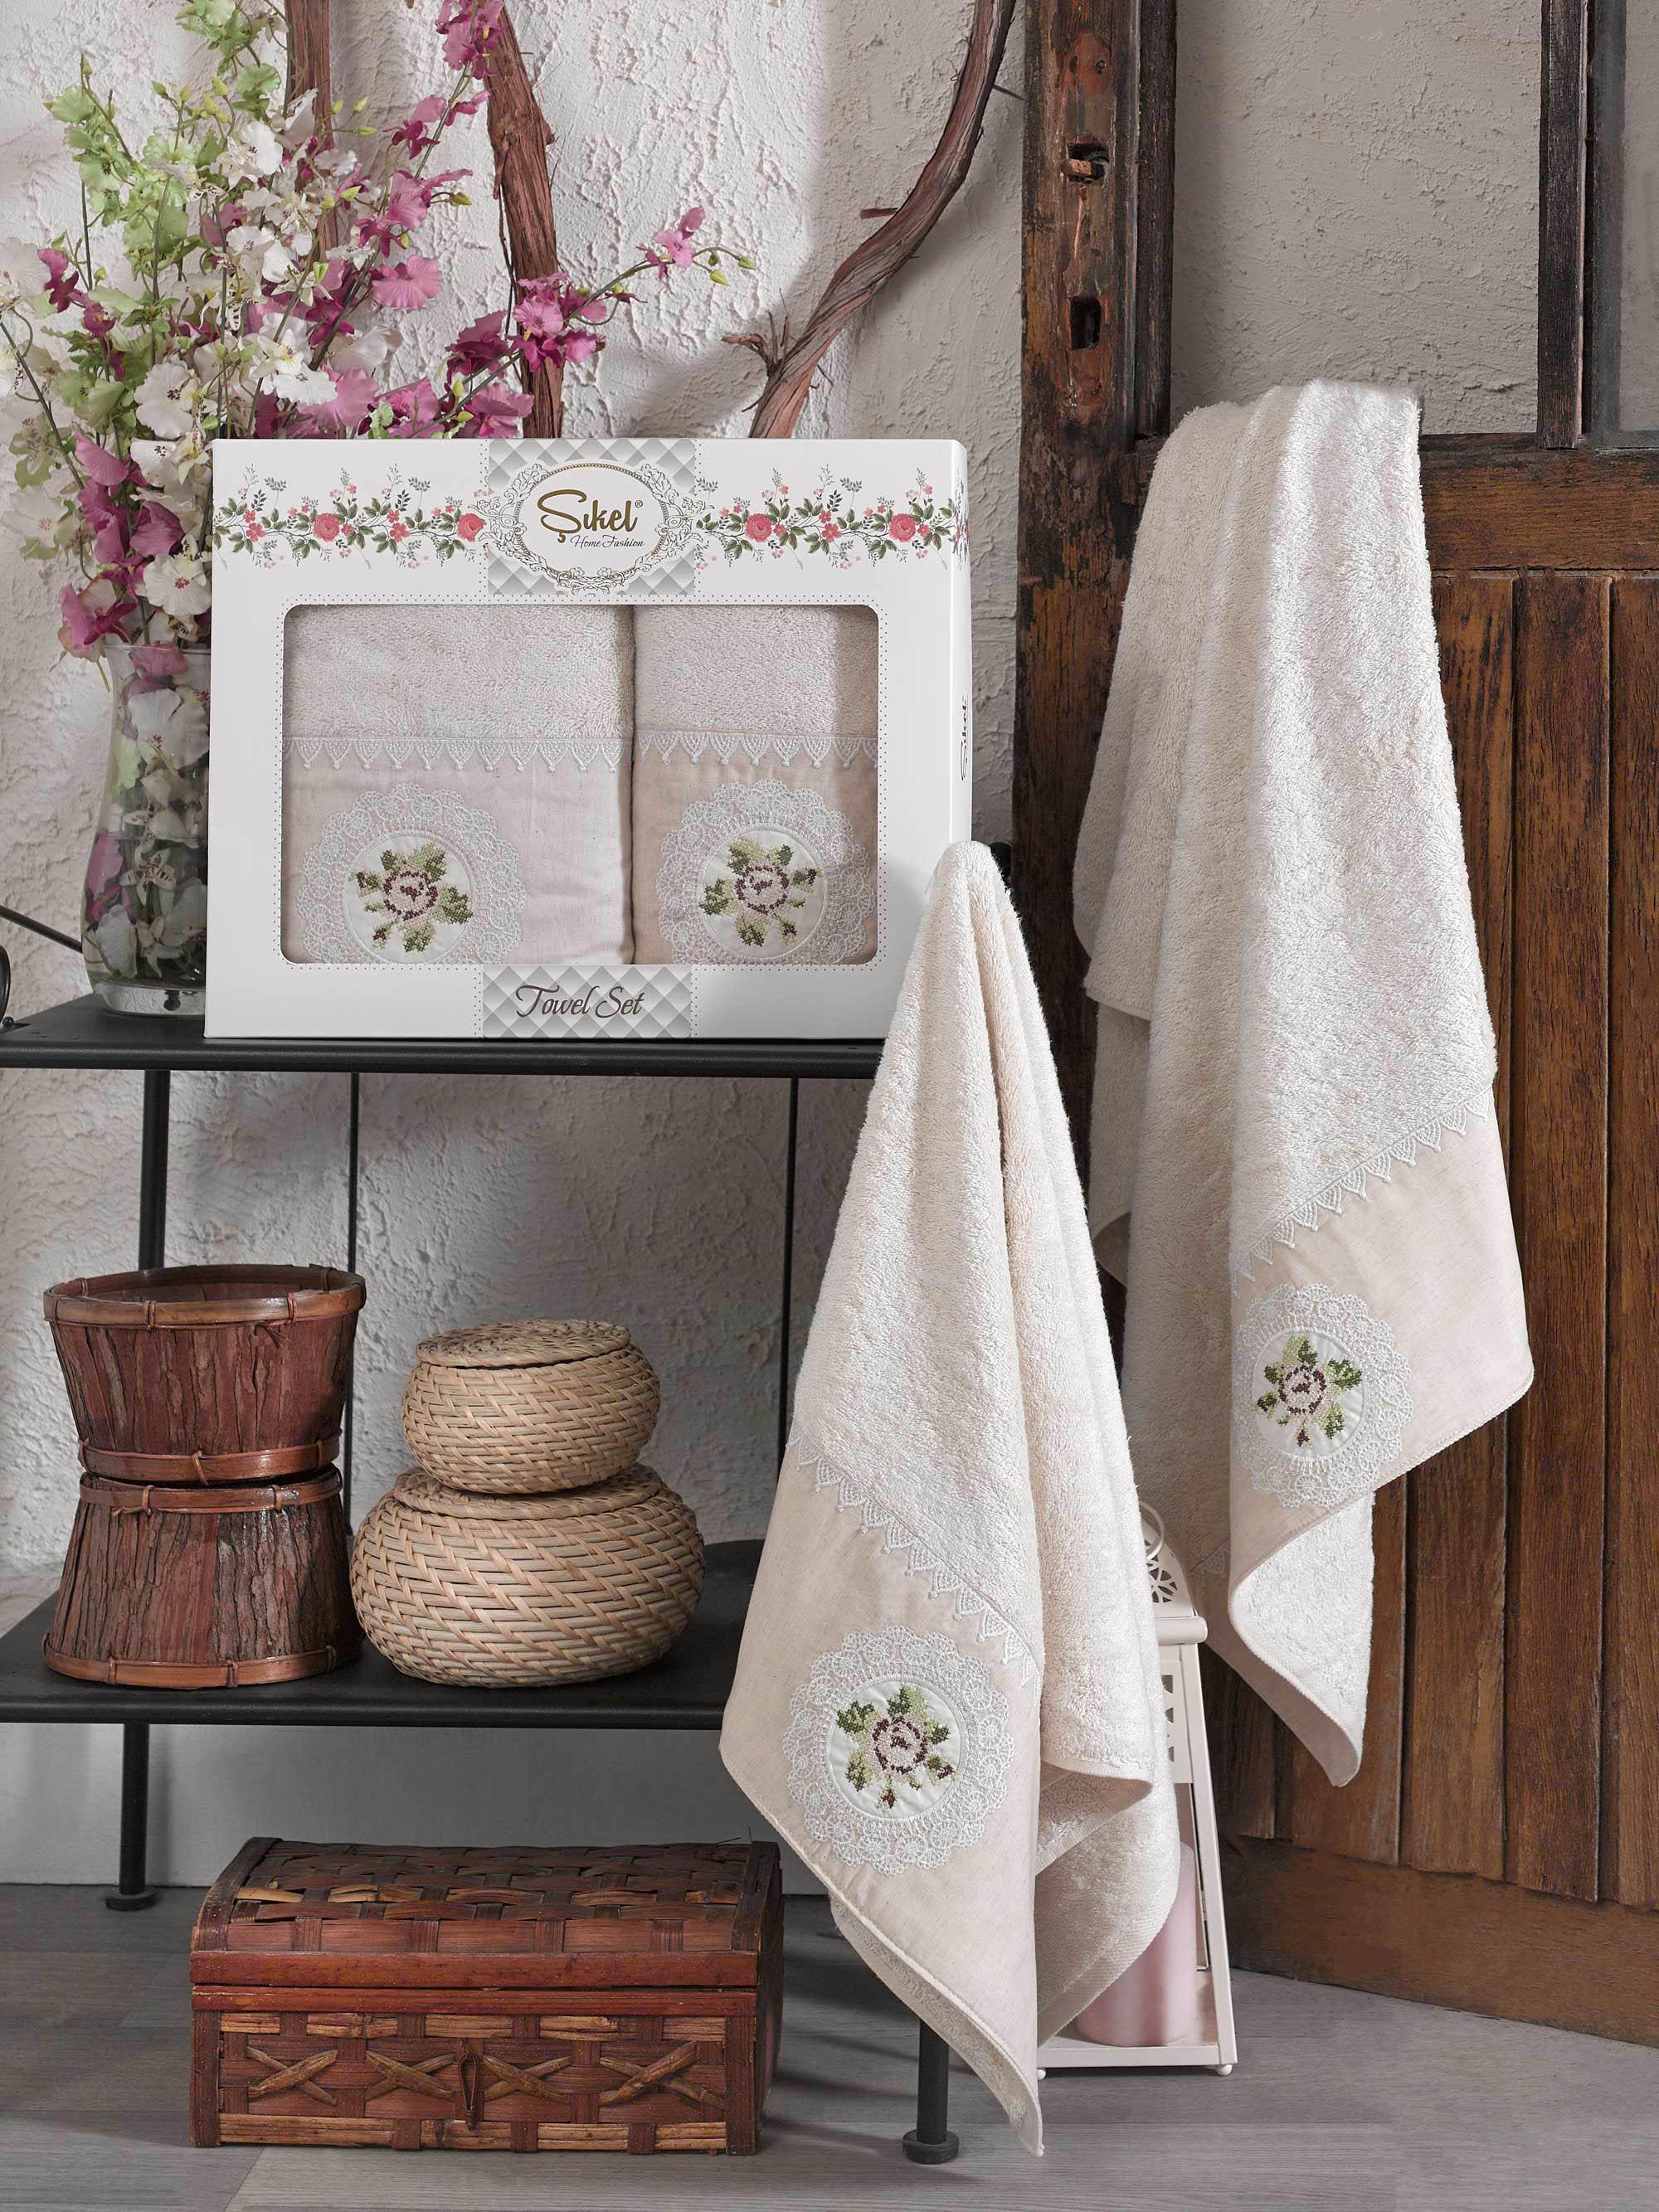 Полотенца Sikel Полотенце Kanevice Цвет: Бежевый (50х90 см,70х140 см) полотенца sikel полотенце kanevice цвет пудра 50х90 см 70х140 см